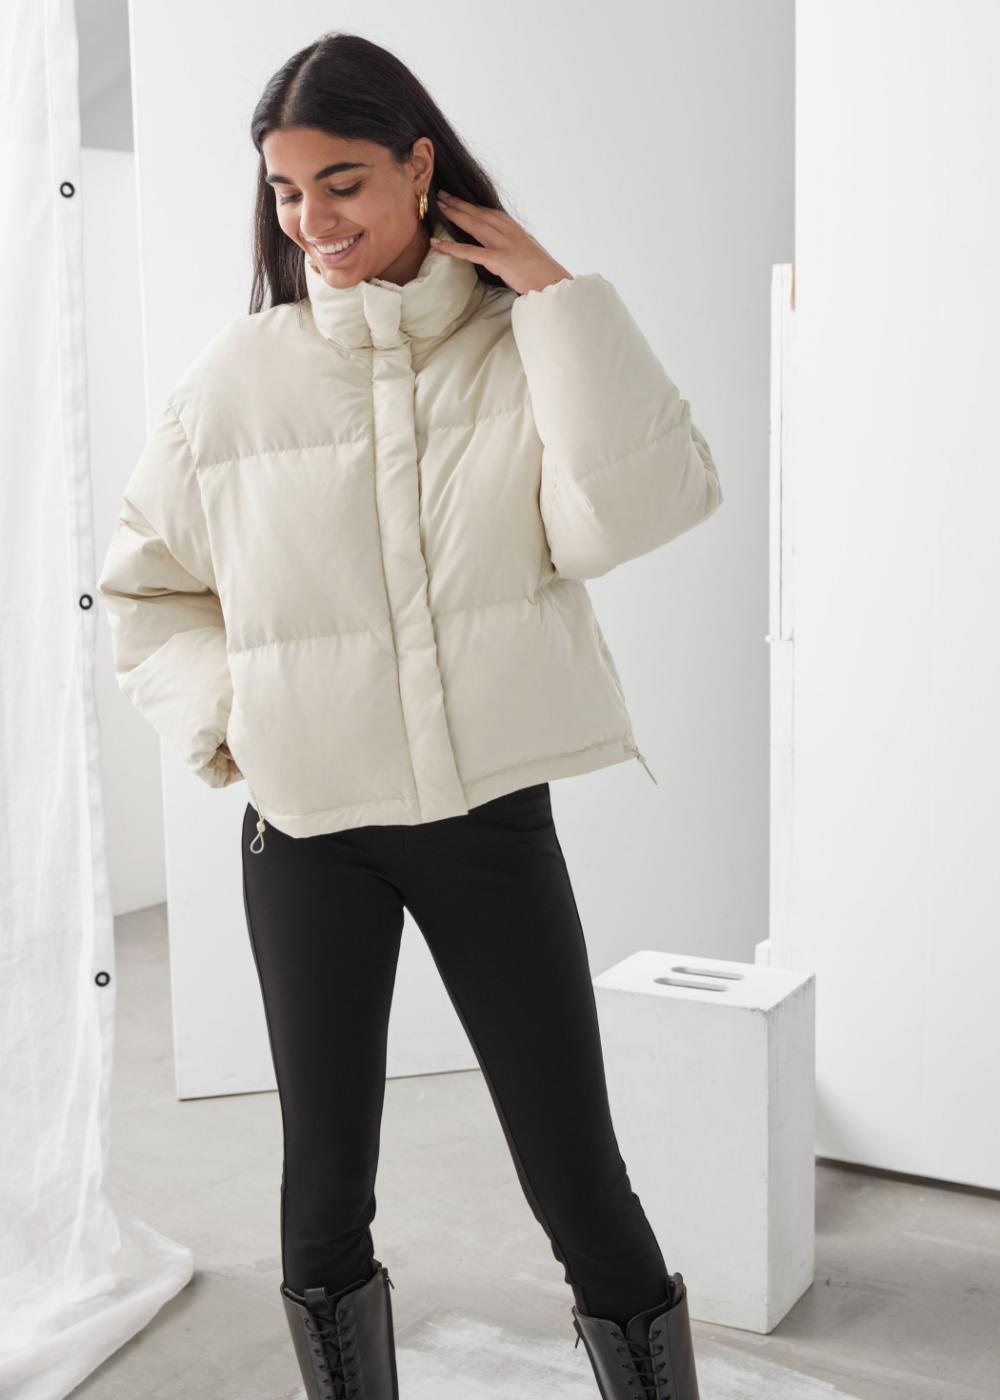 Short Oversized Puffer Jacket White Puffer Jacket Outfit Oversized Puffer Puffer Jacket Outfit [ 1400 x 1000 Pixel ]